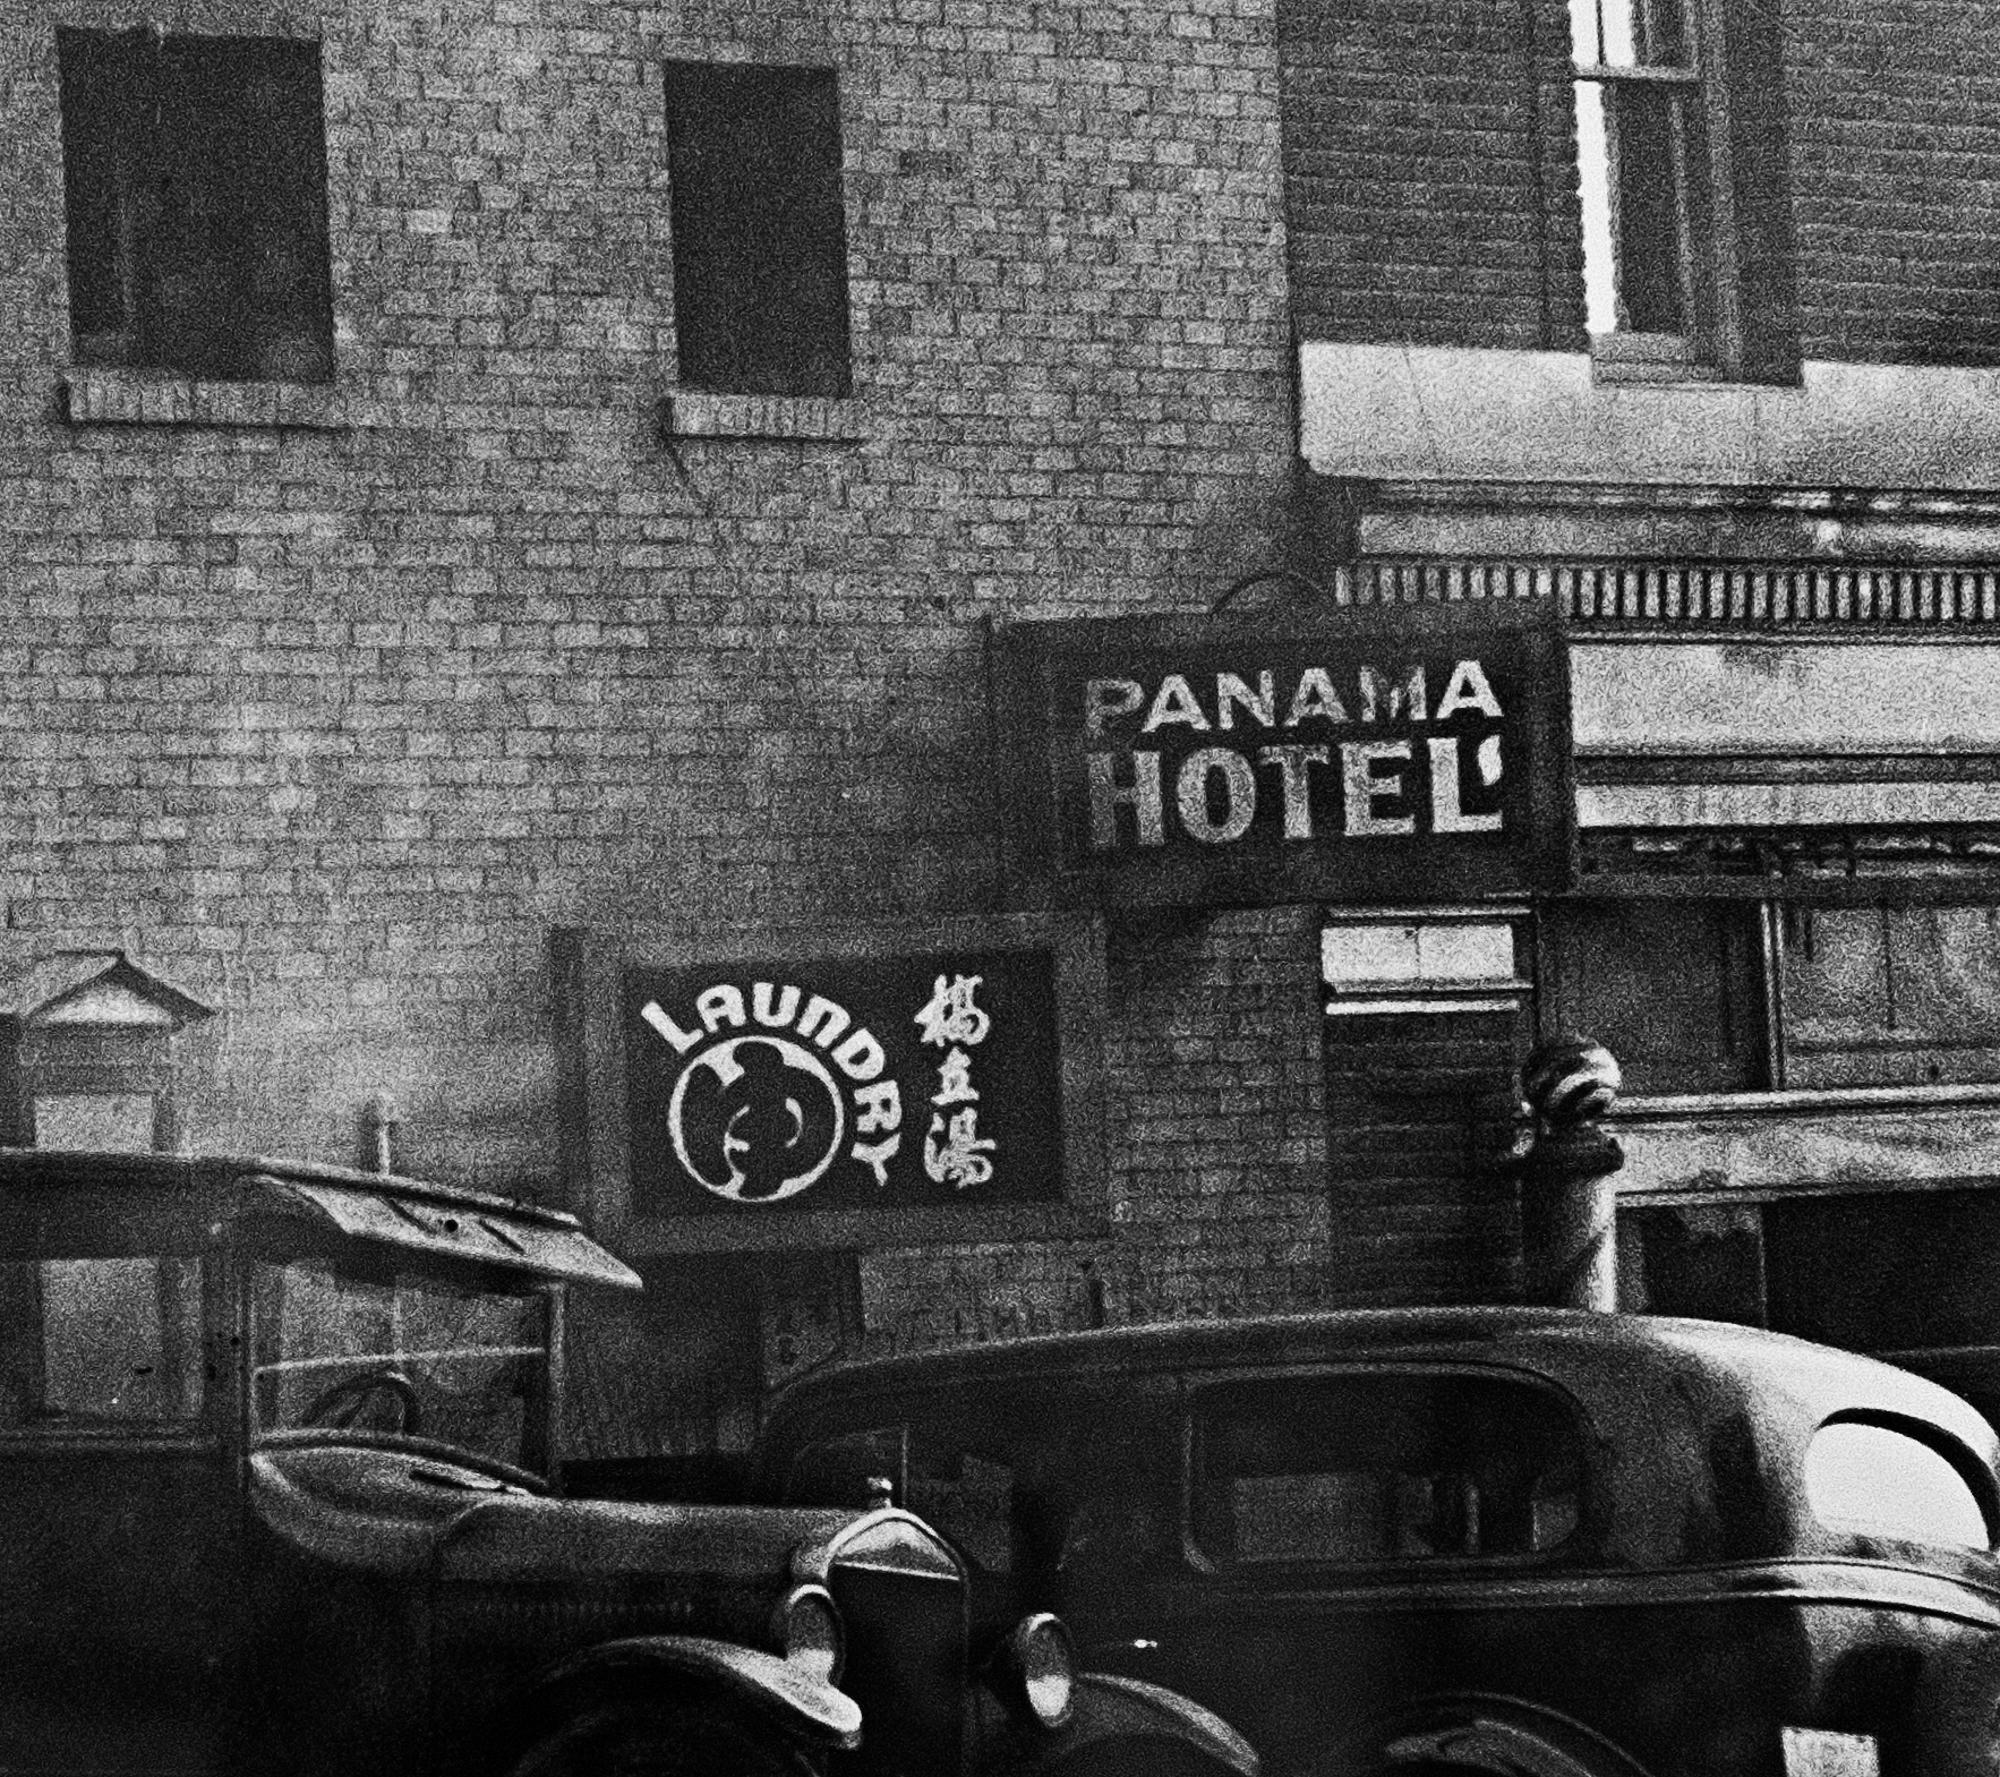 Panama-1-29.jpg